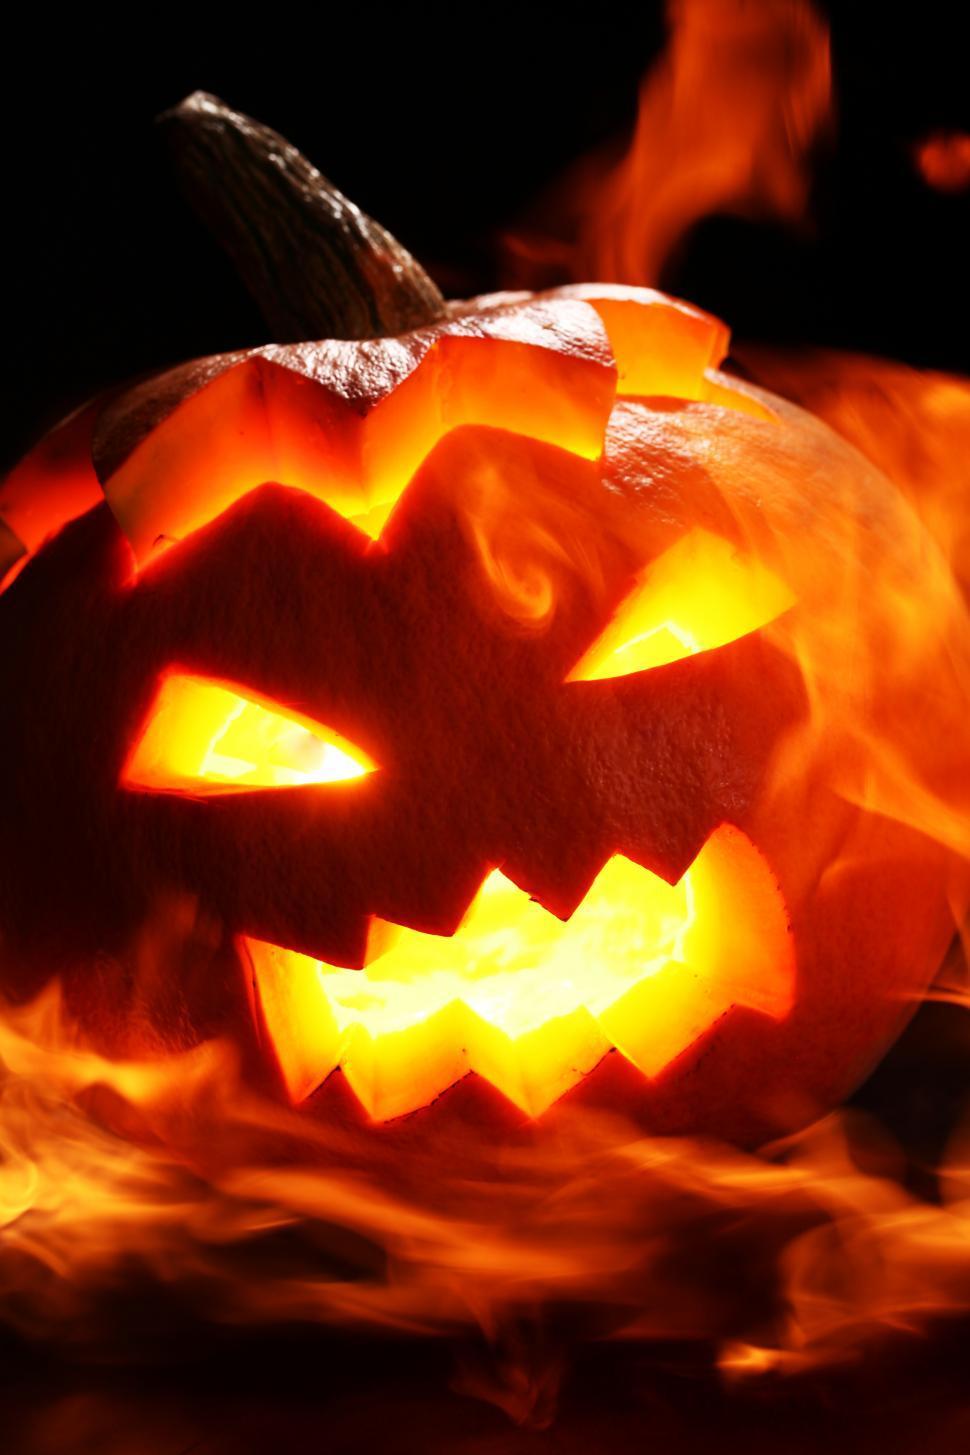 Download Free Stock Photo of Dark scene with bright, flaming jack o lantern